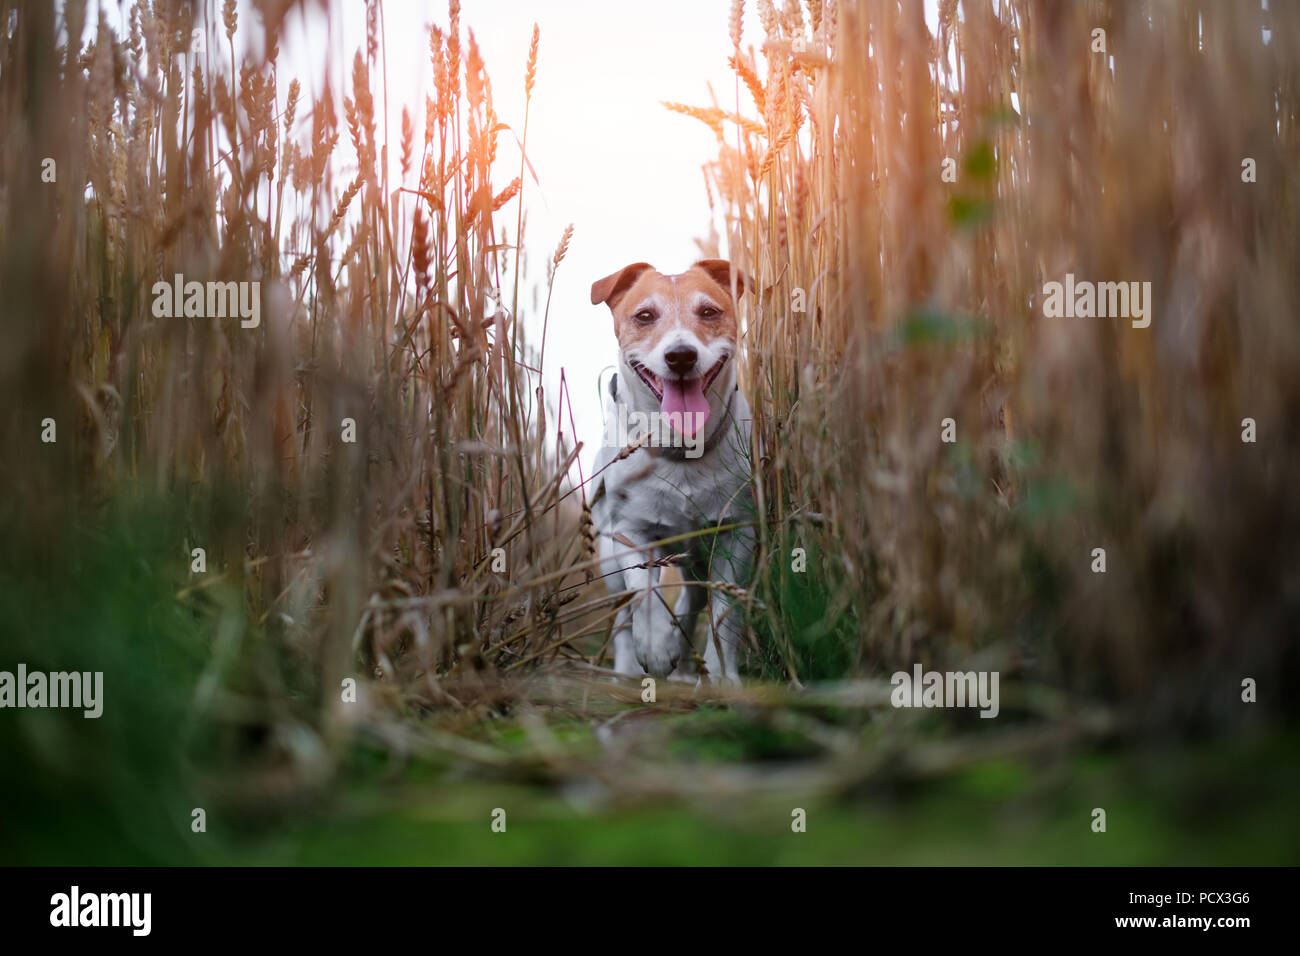 Jack russel terrier on wheat field road - Stock Image